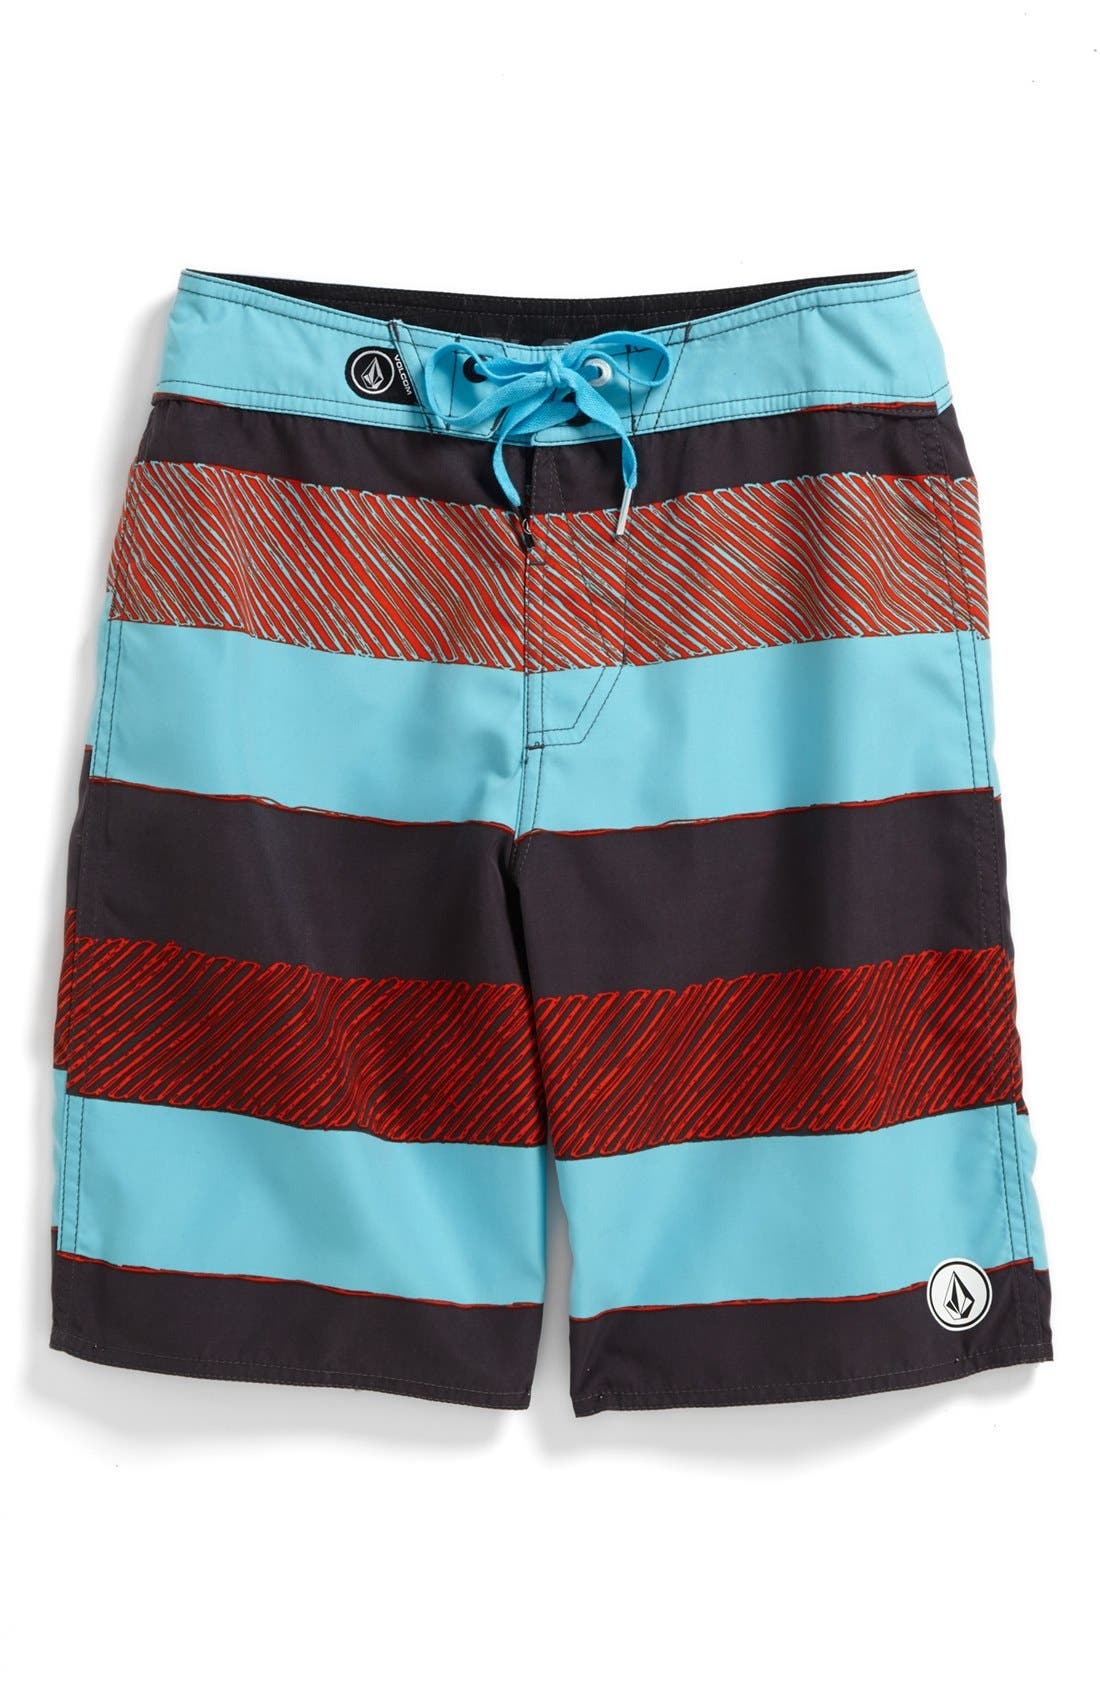 Main Image - Volcom 'De Soto St.' Board Shorts (Big Boys)